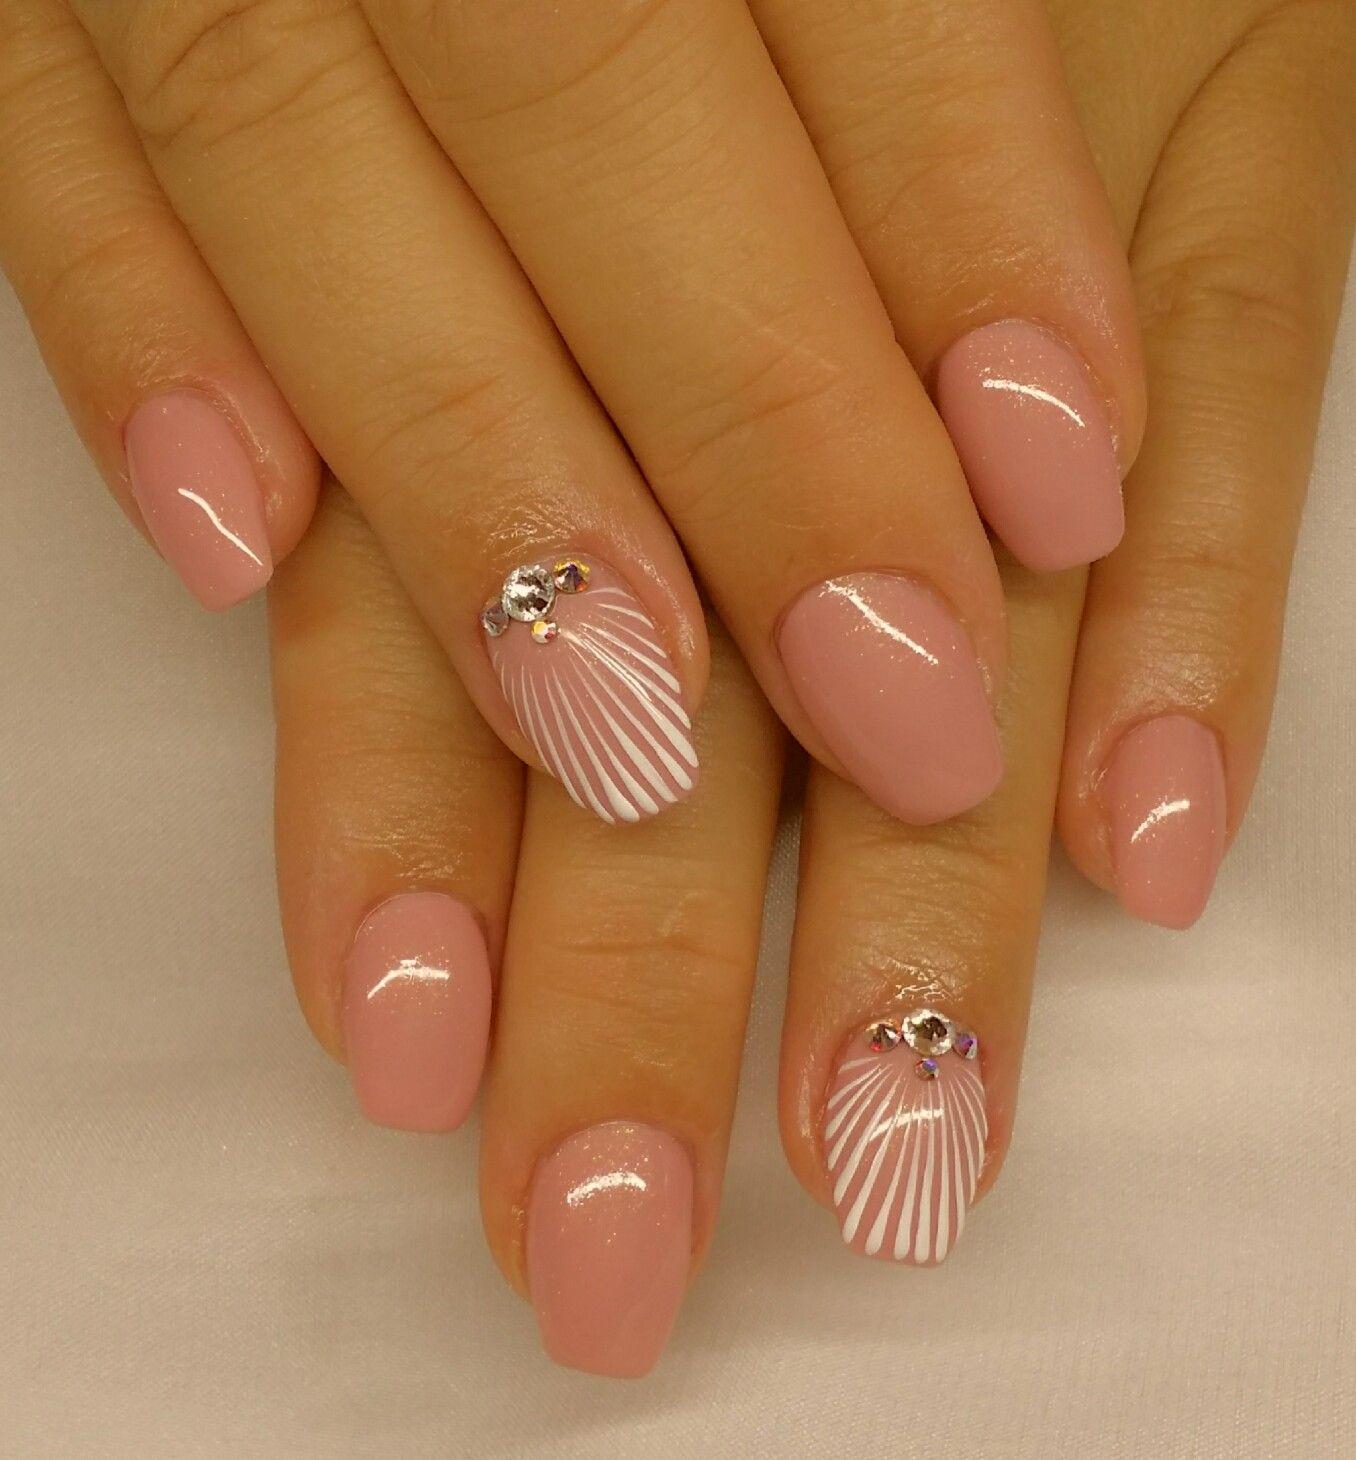 Galeria Zseles Mukorom Porcelan Mukorom Gel Lakk Manikur Pedikur Kepek Slynails A Legnagyobb Kormosszalo Elegant Nail Art Elegant Nails Pink Gel Nails